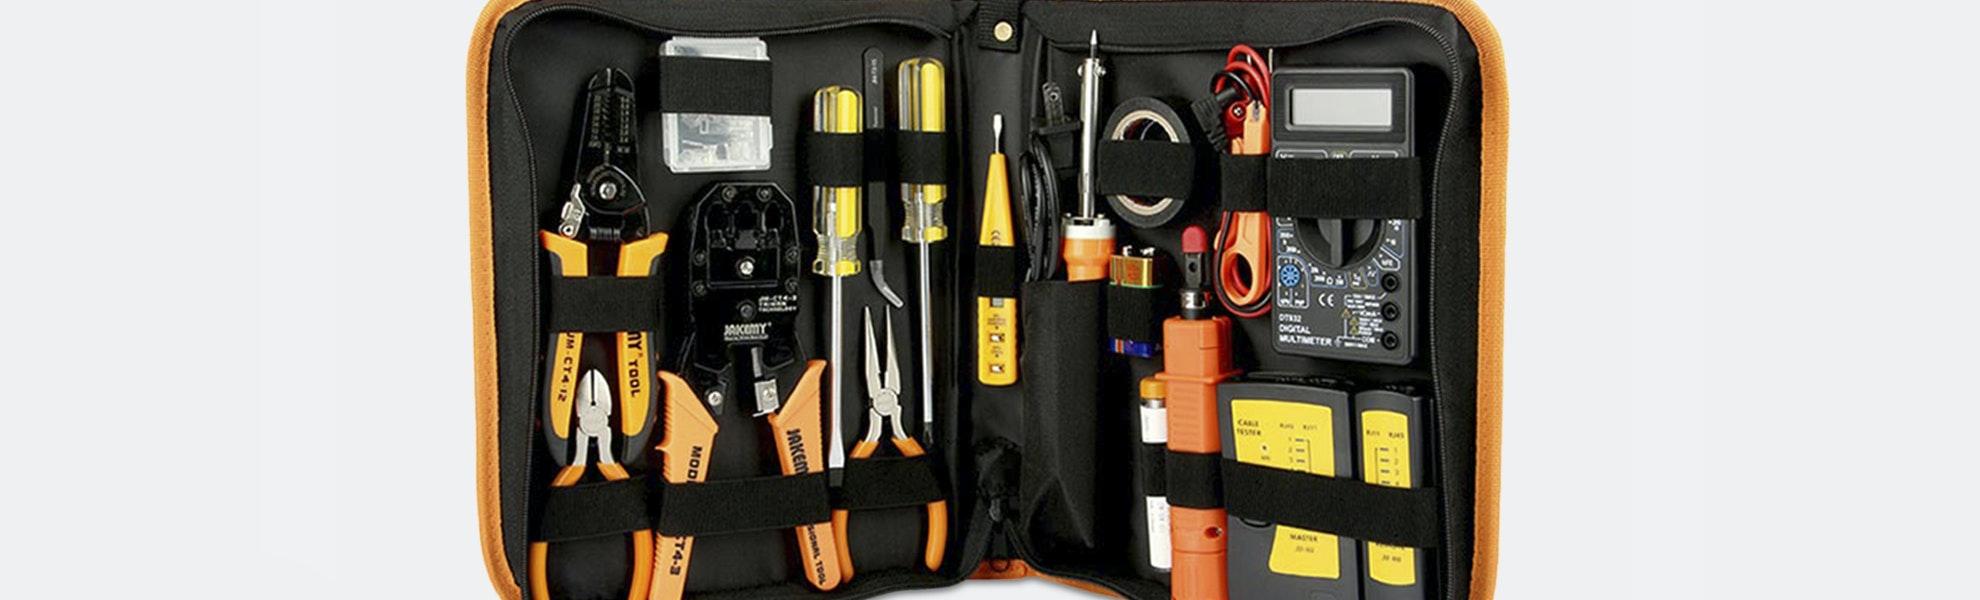 Jakemy 17-in-1 Network Repair Kit & Soldering Iron